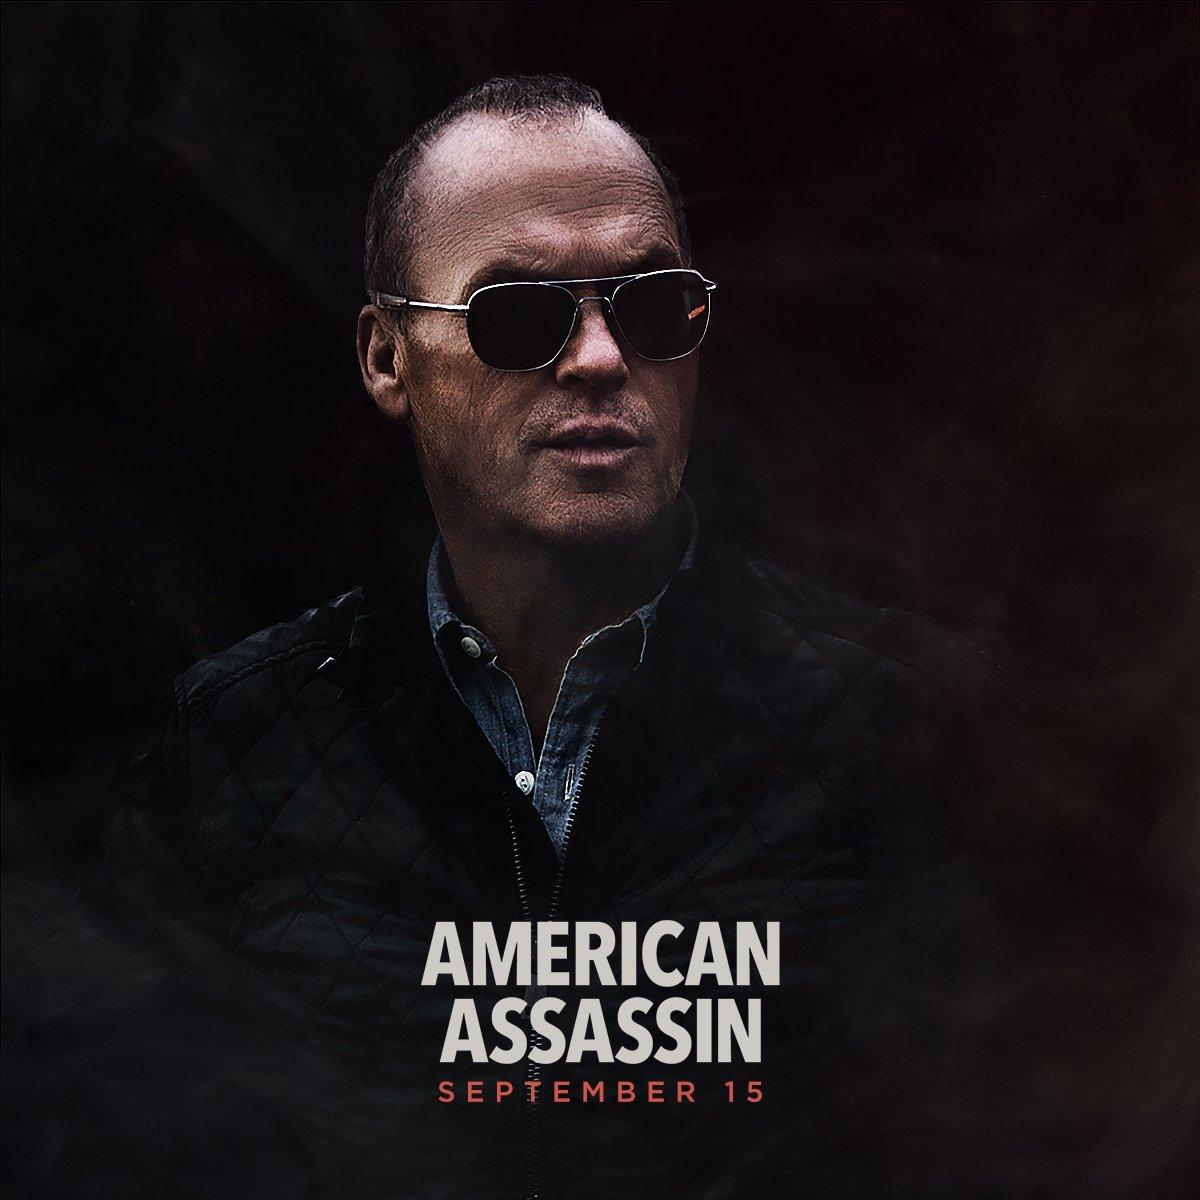 american assassin character poster 4 - Michael Keaton.jpg